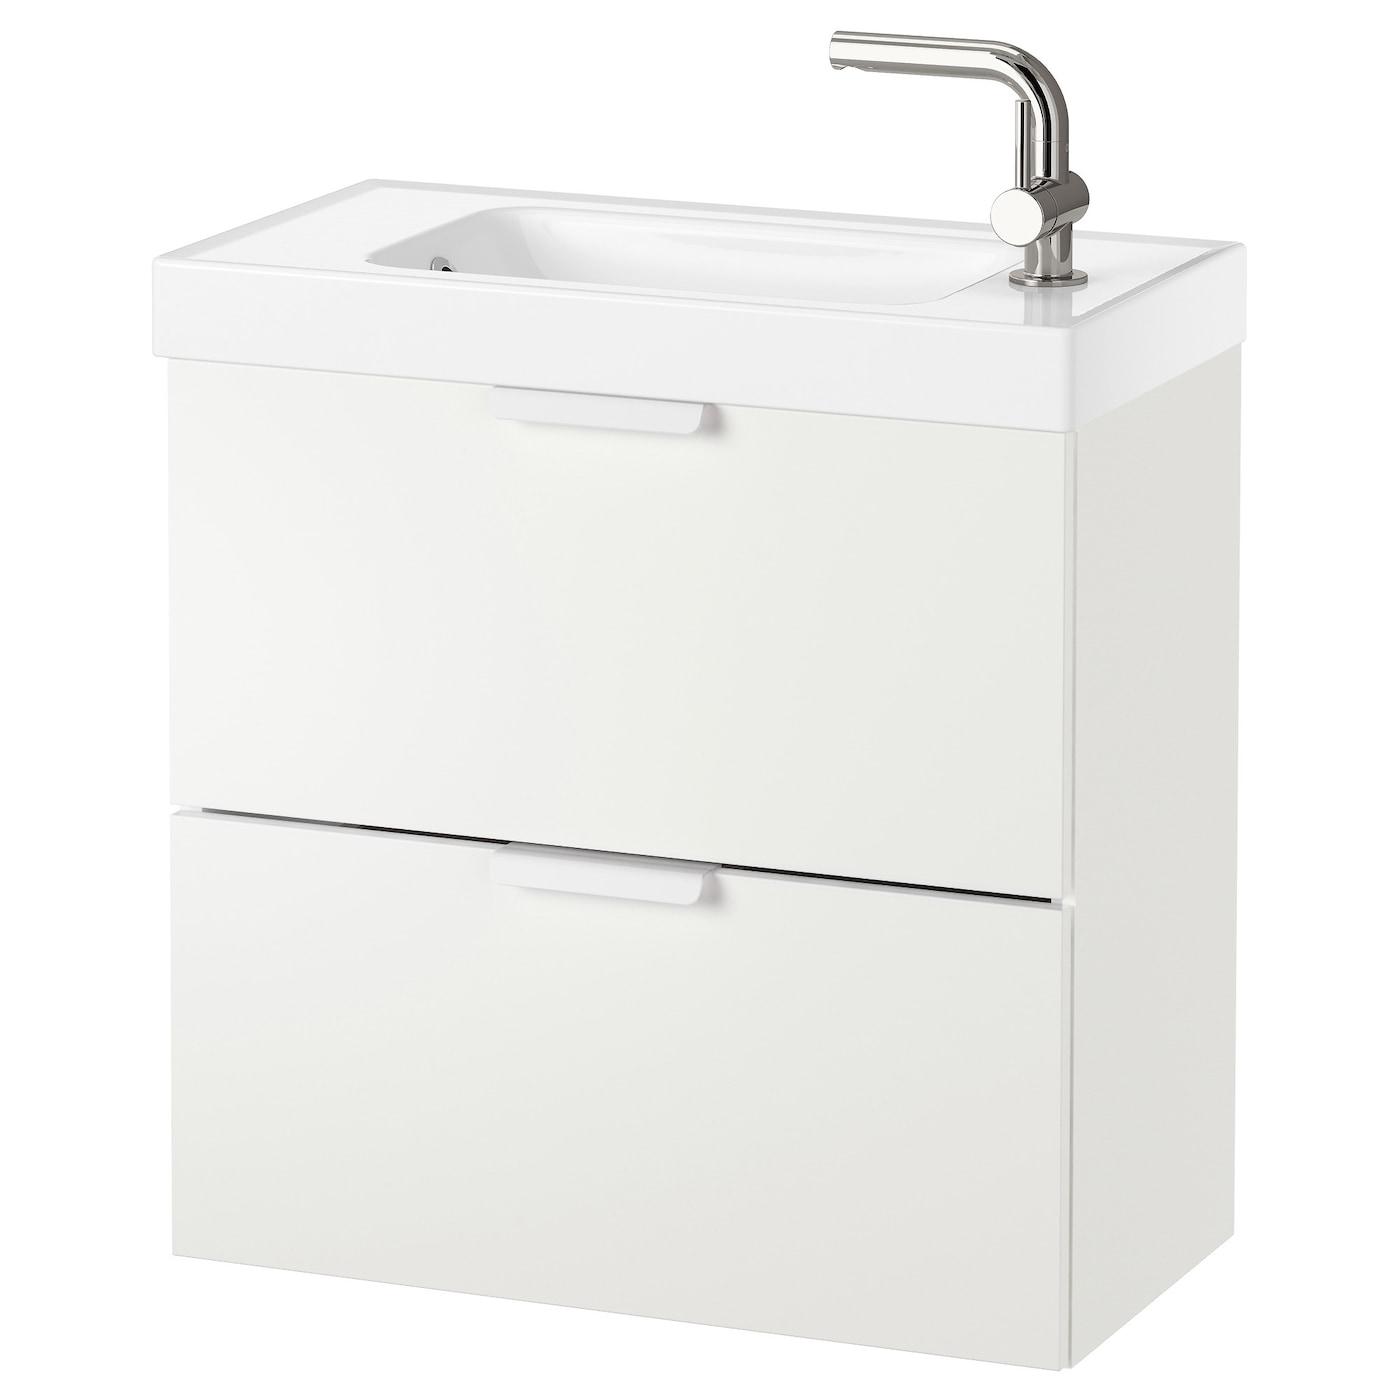 godmorgon hagaviken wash stand with 2 drawers white 62 x 34 x 65 cm ikea. Black Bedroom Furniture Sets. Home Design Ideas